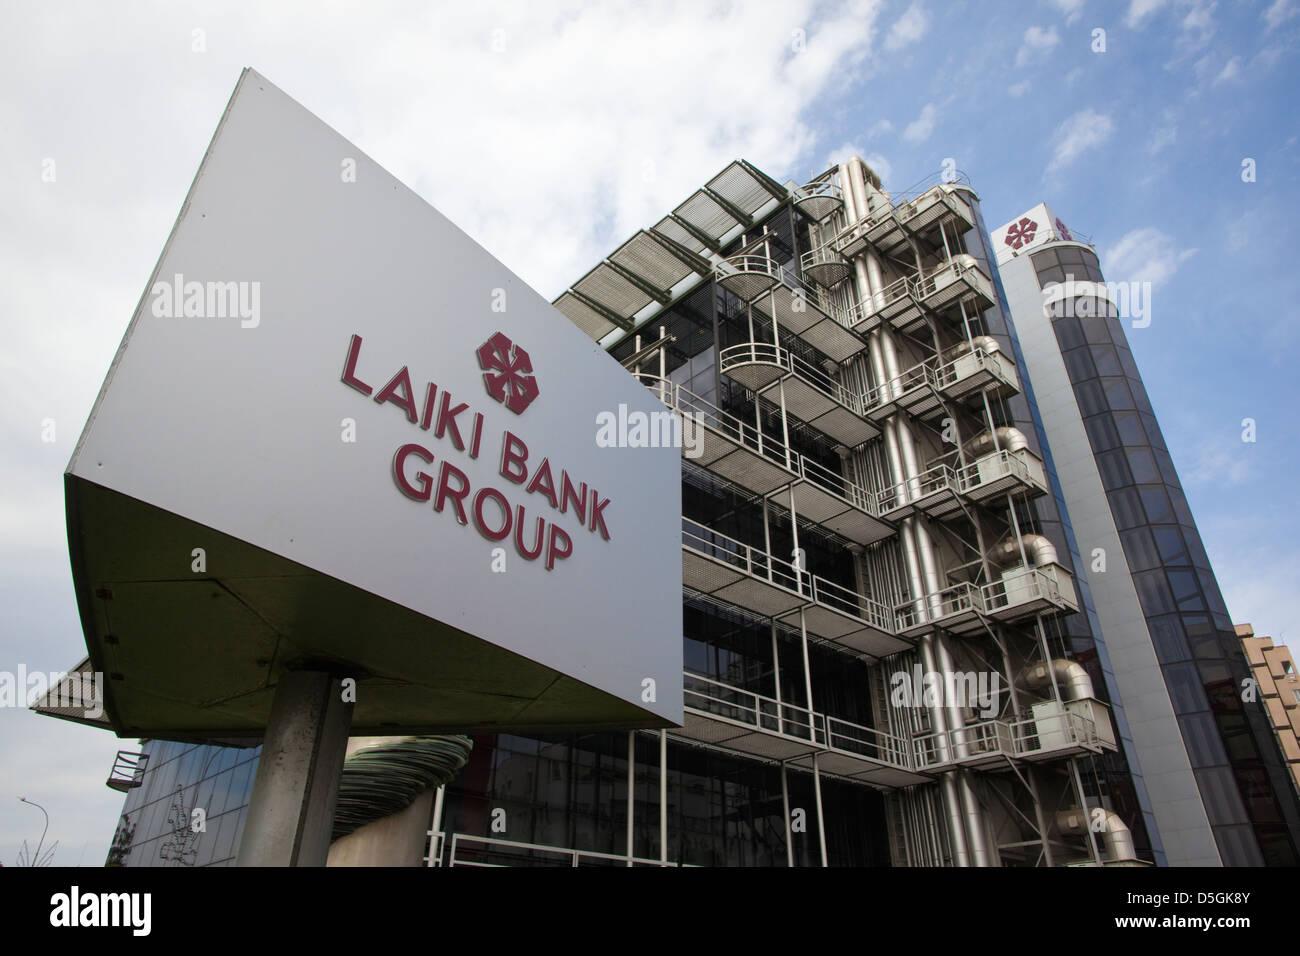 Laiki Bank headquarters in Nicosia, Cyprus. Stock Photo